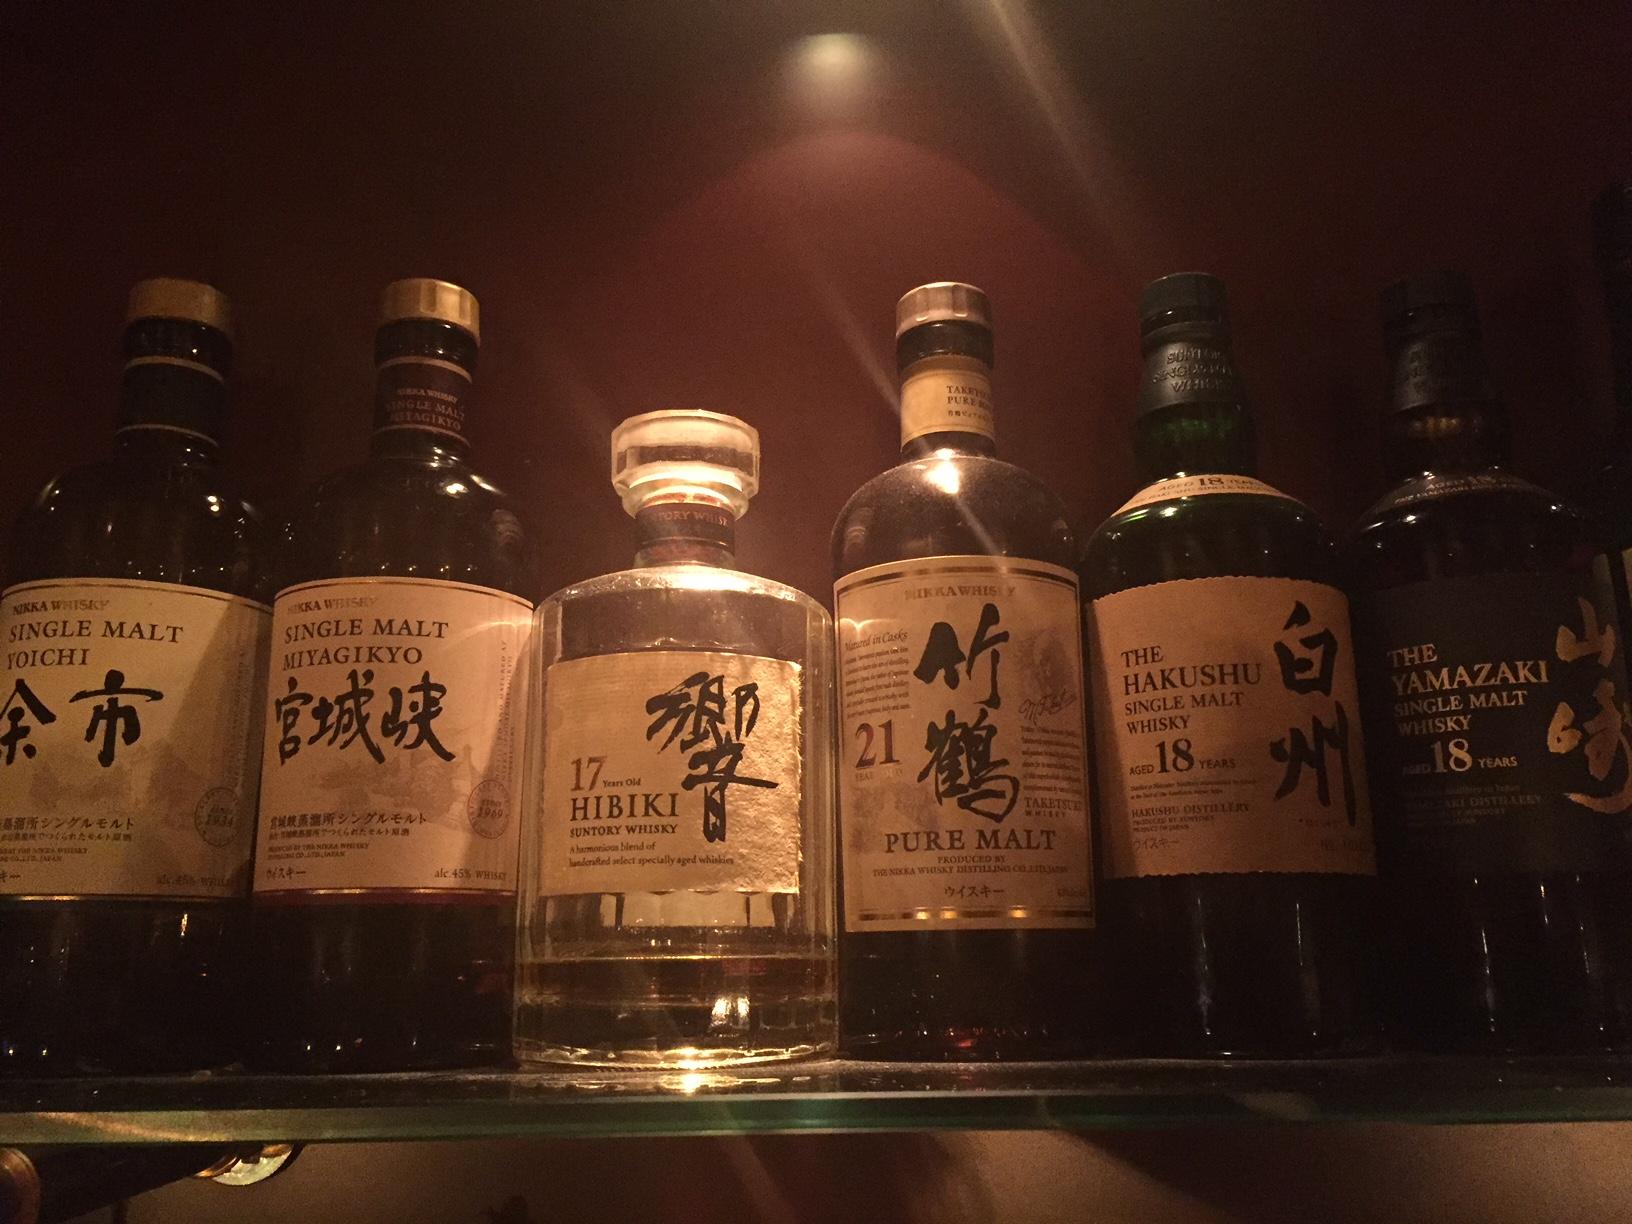 Japanese Wisky